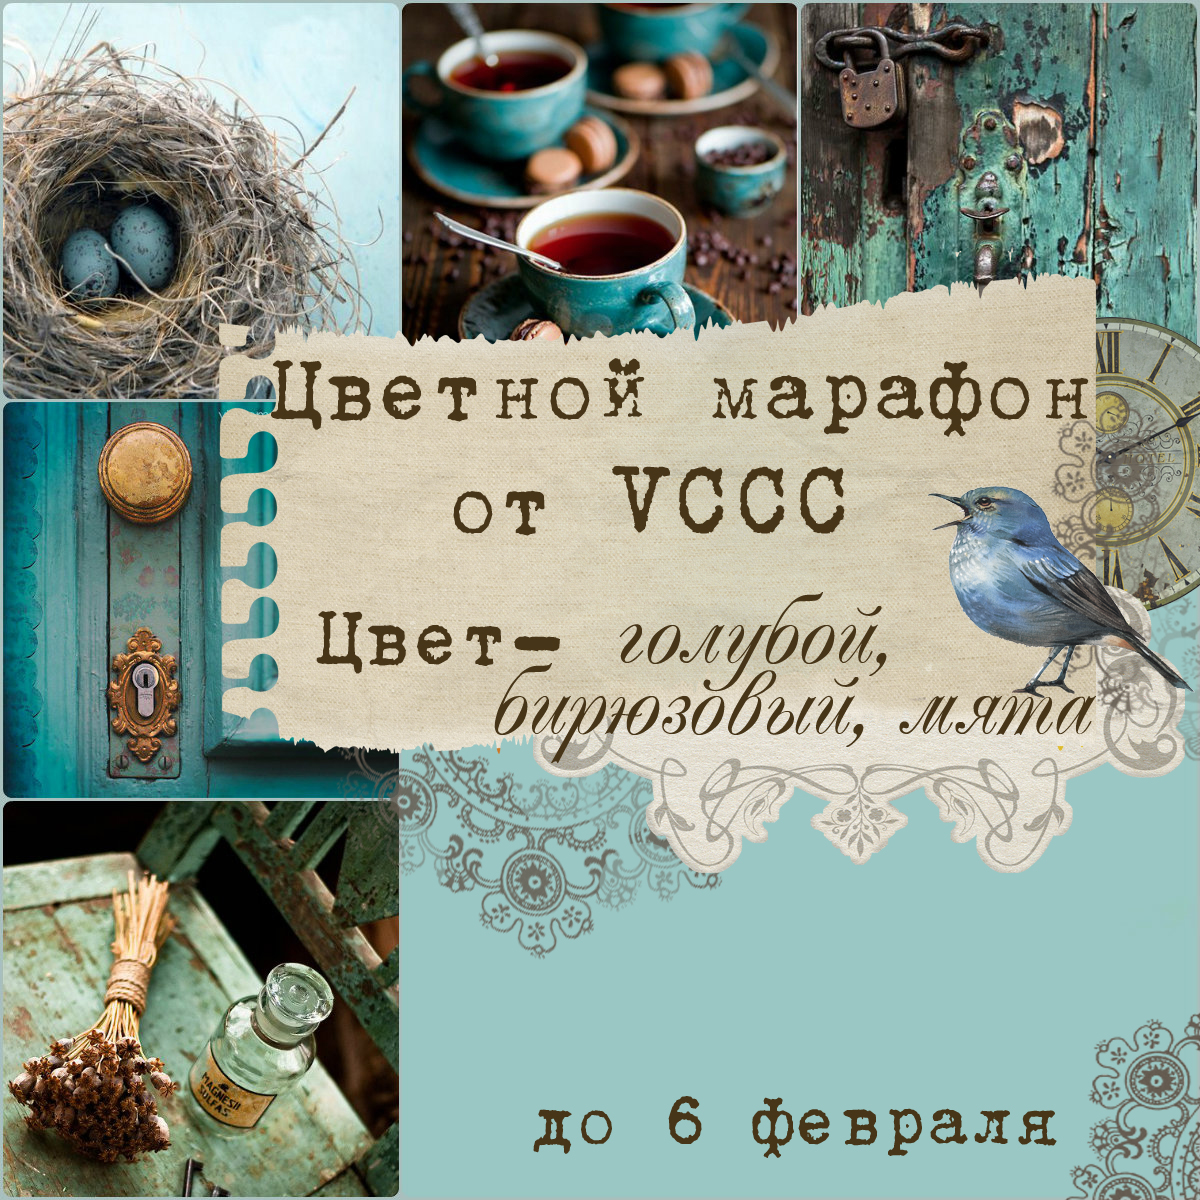 http://vintagecafecard.blogspot.com/2015/01/2_28.html